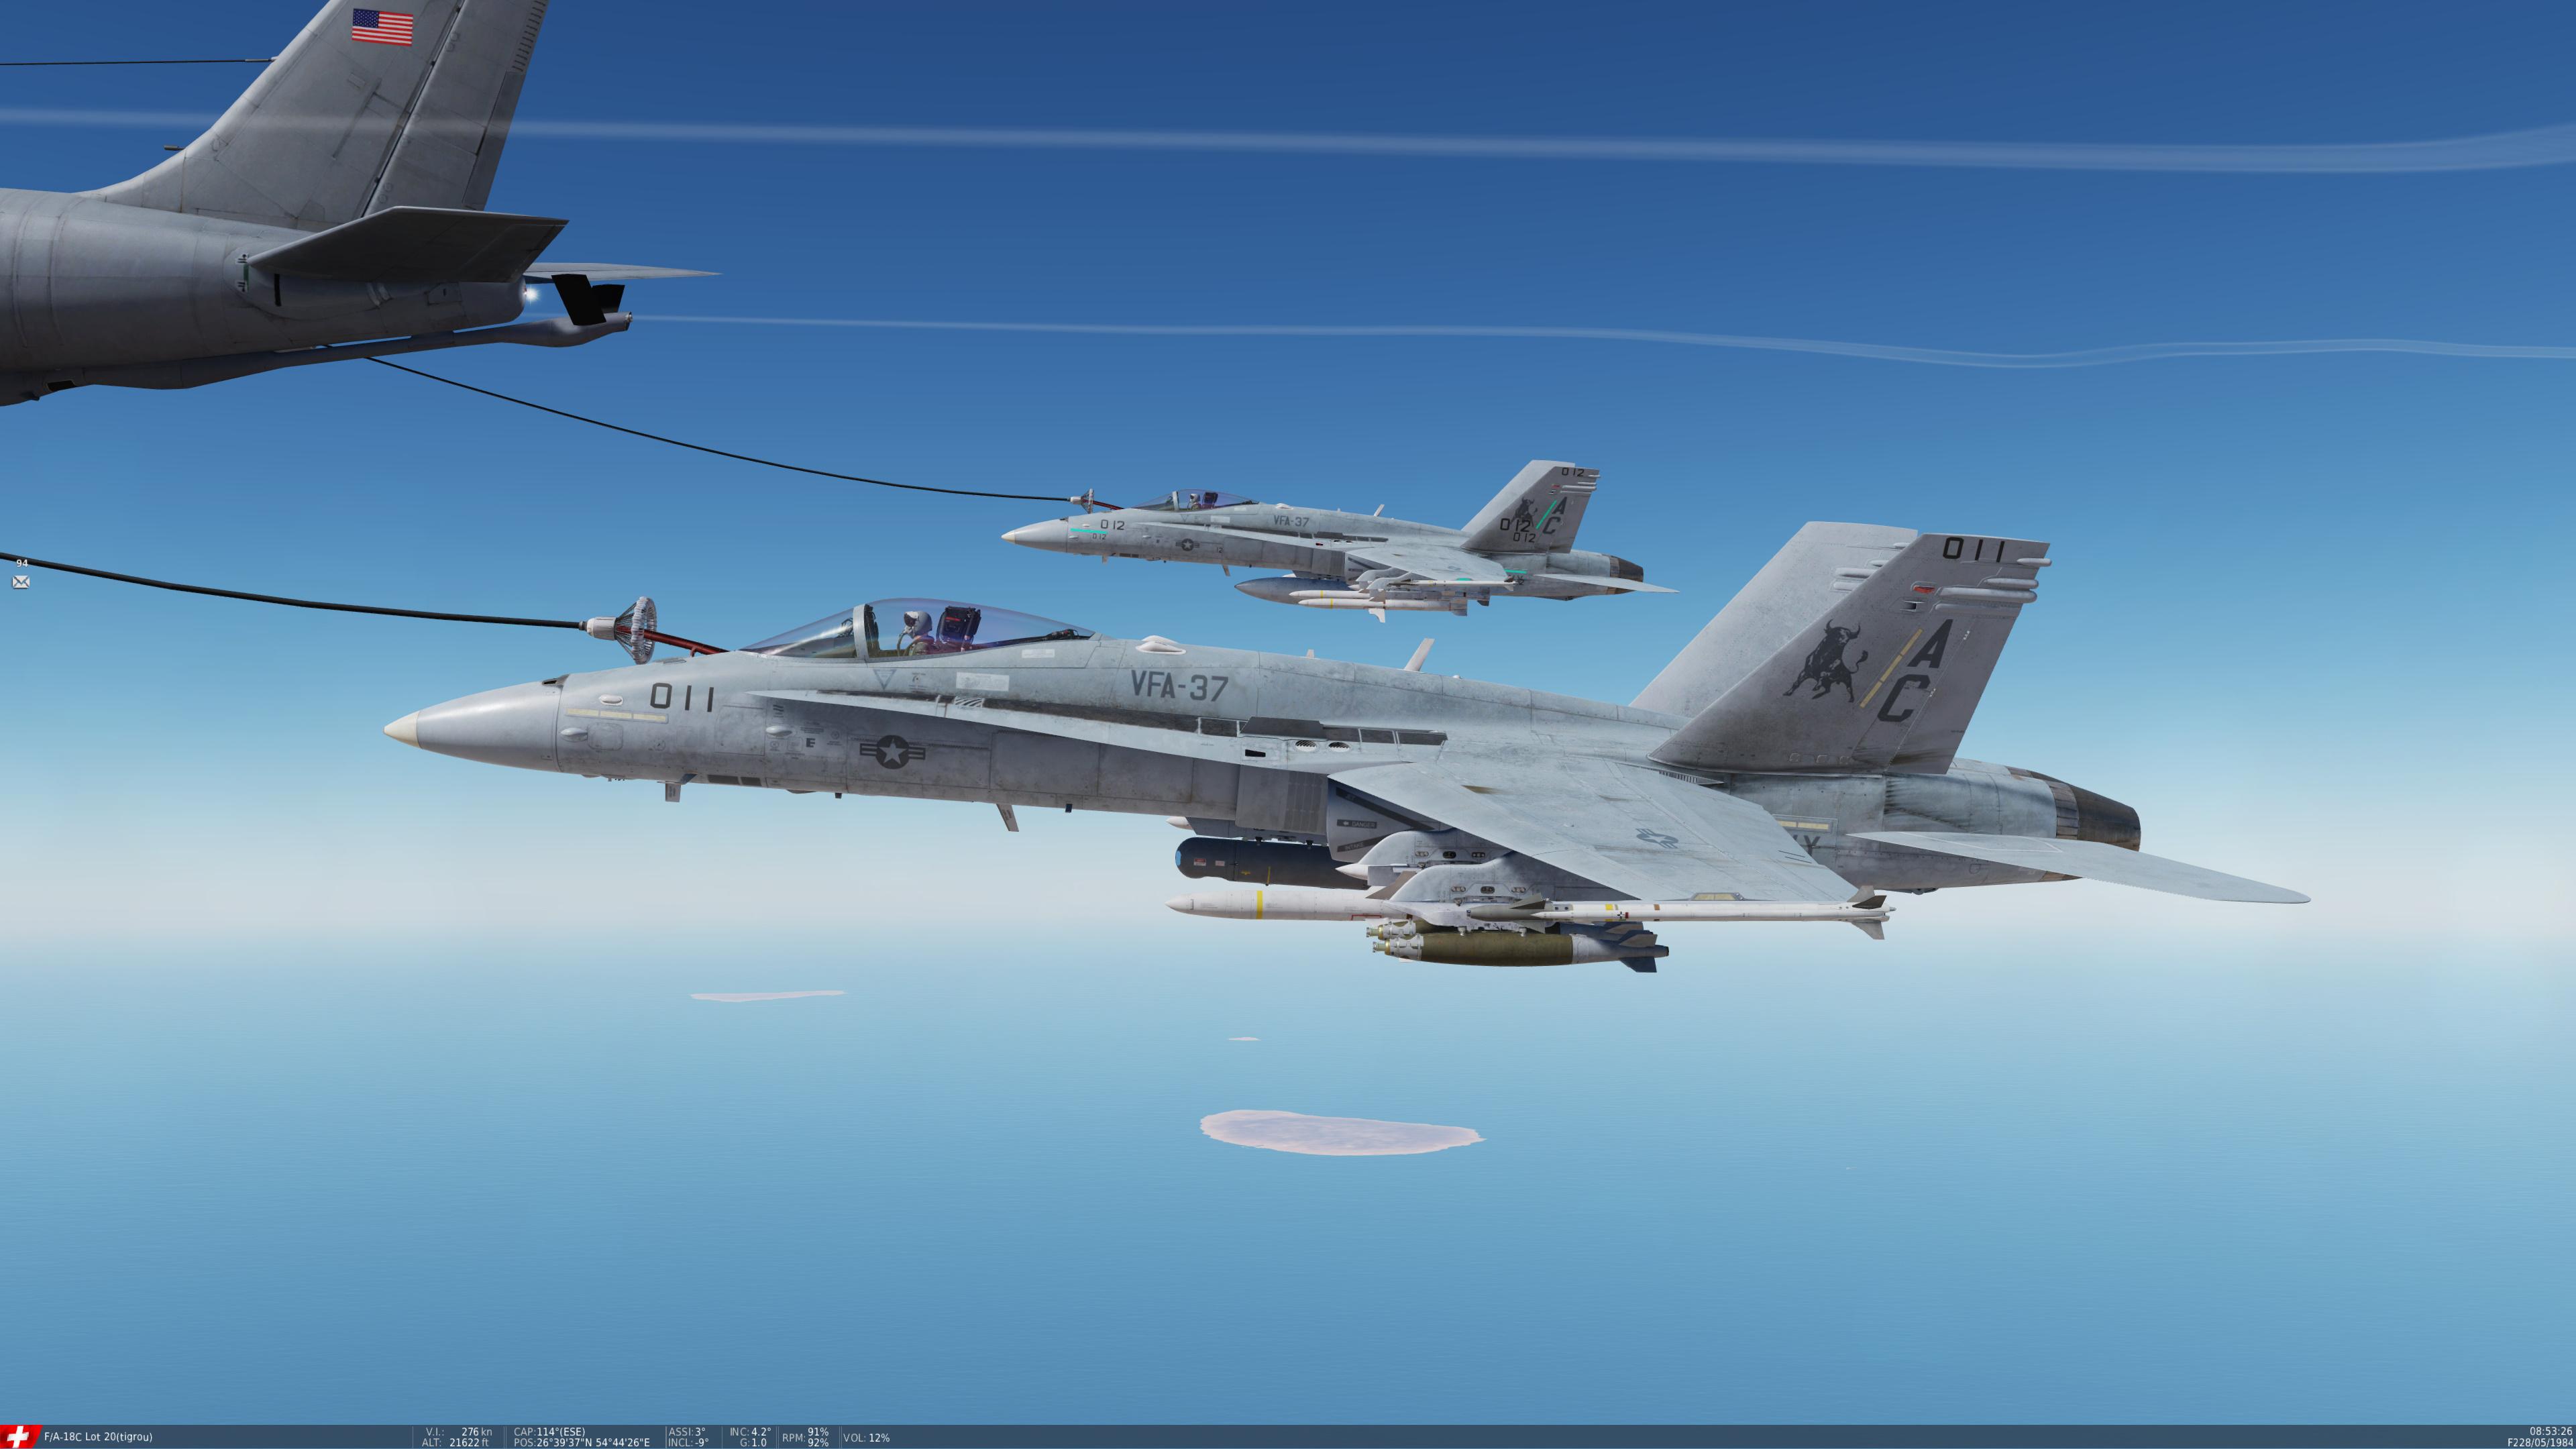 [Cursus UH-1H Huey] Photos de nos missions Bandicam_2021-01-26_23-00-16-698